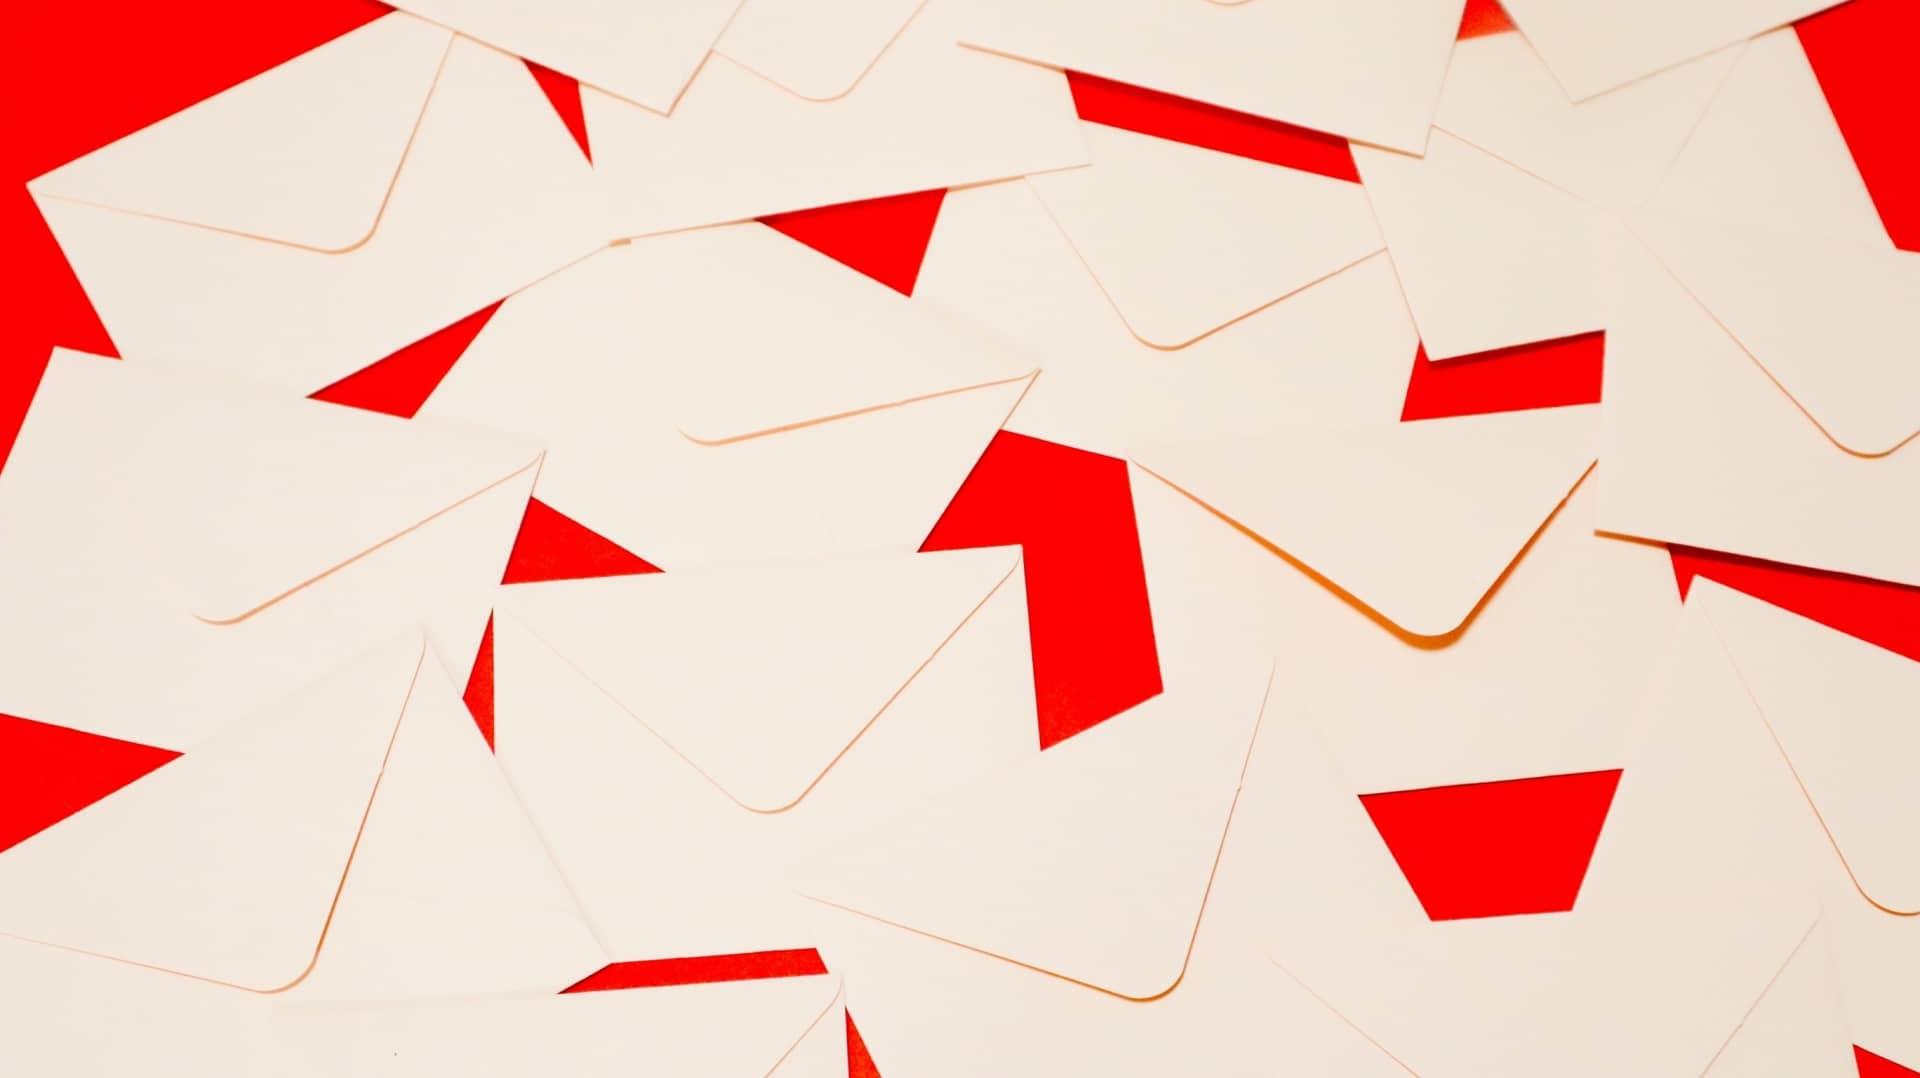 EC-CUBEでプラグインの競合により受注完了メールが送信されない事象が発生